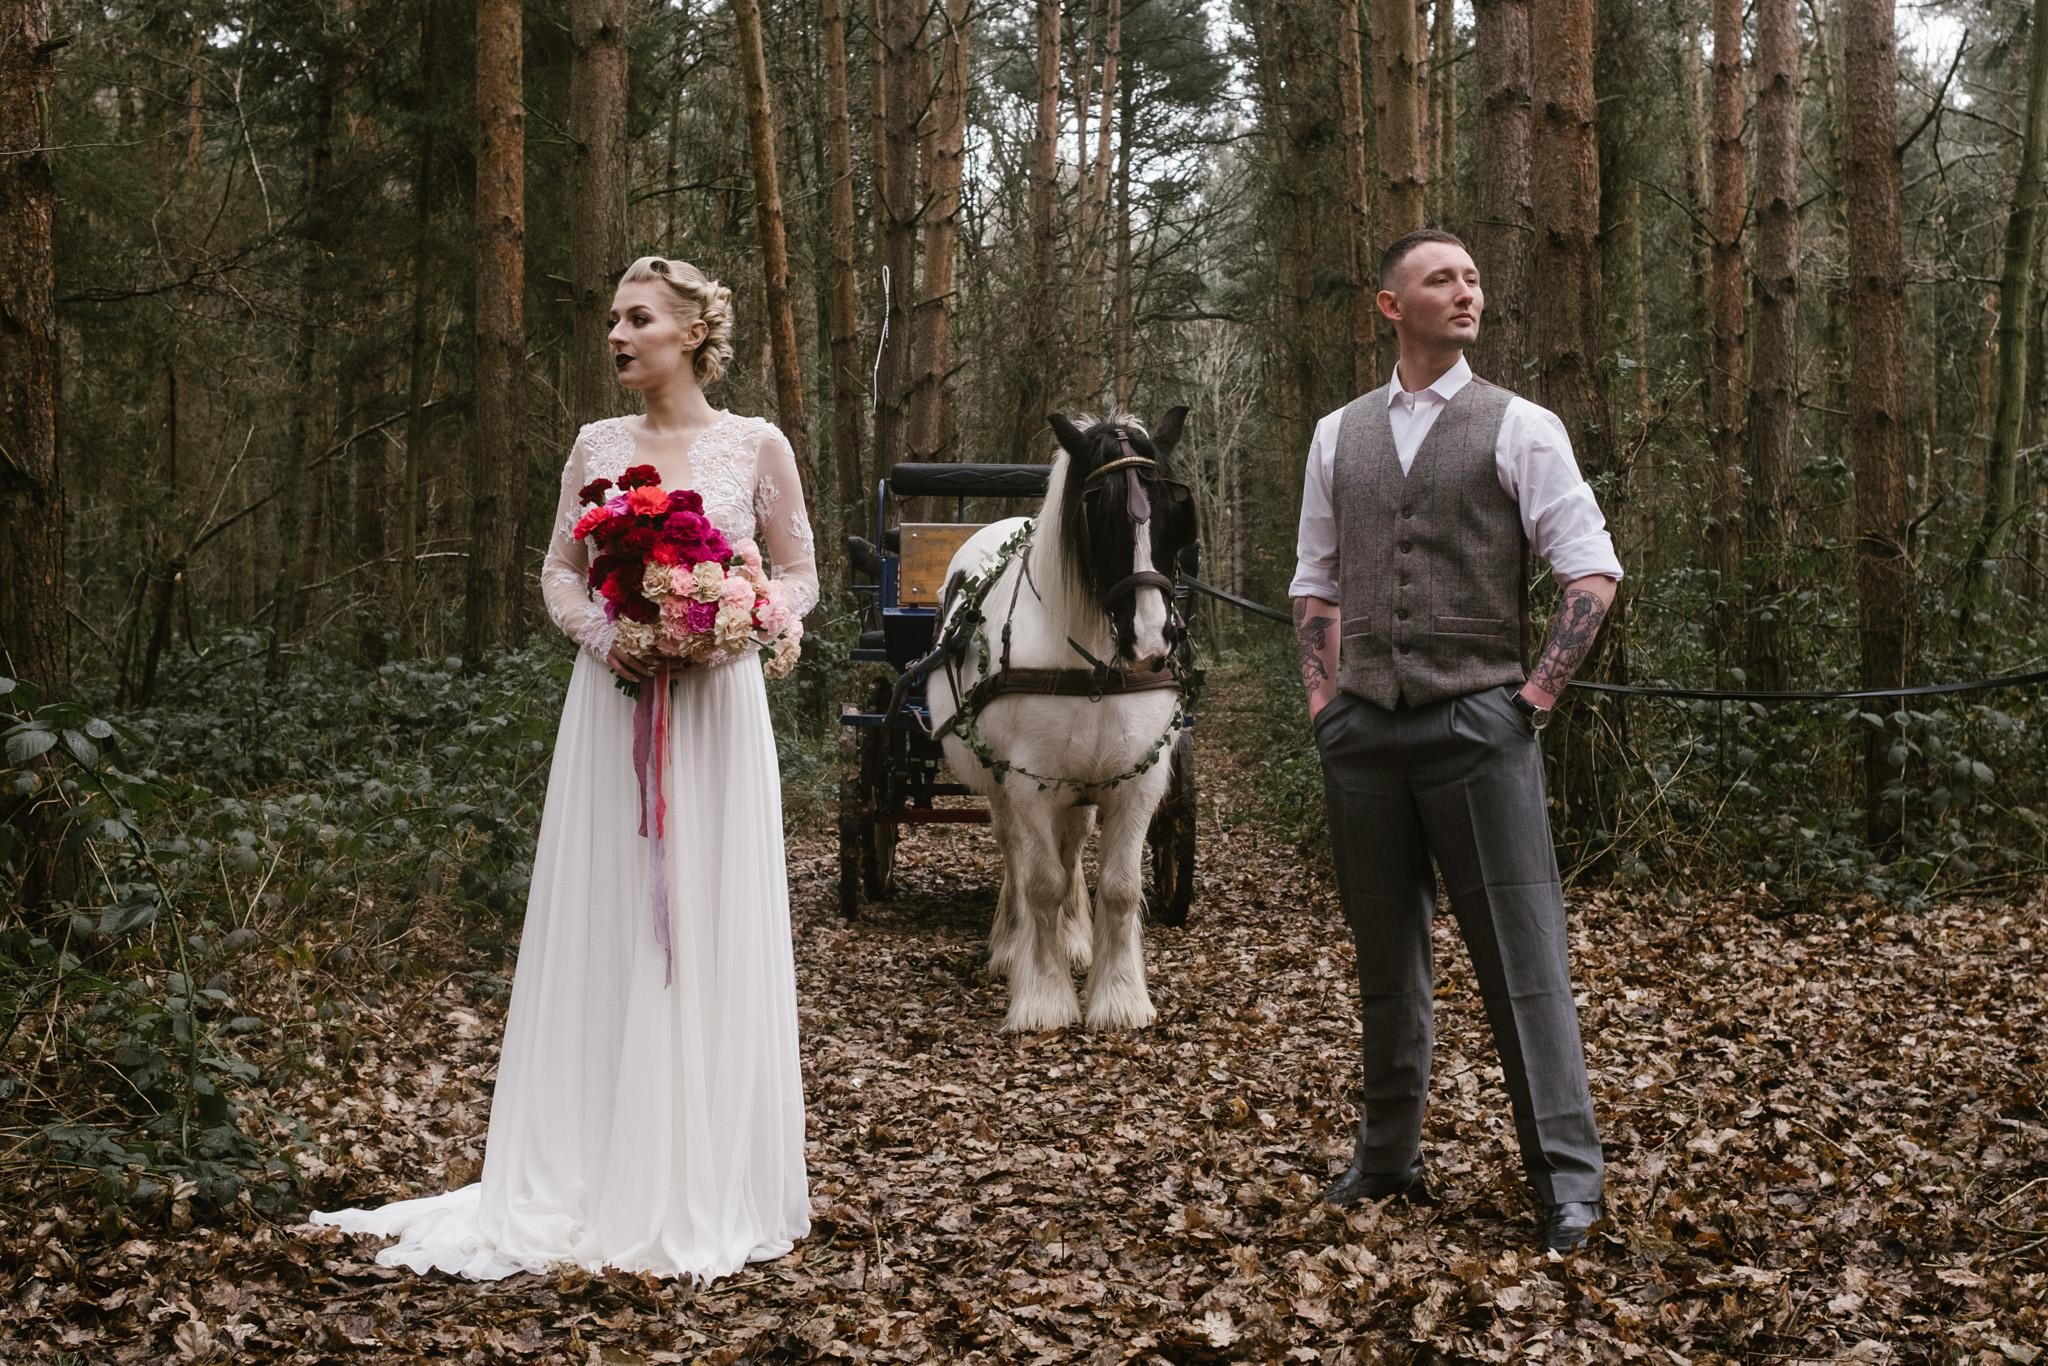 Captains-Wood-Barn-Alterative-Rustic-Vintage-Essex-Wedding-Suffolk-Grace-Elizabeth-24.jpg